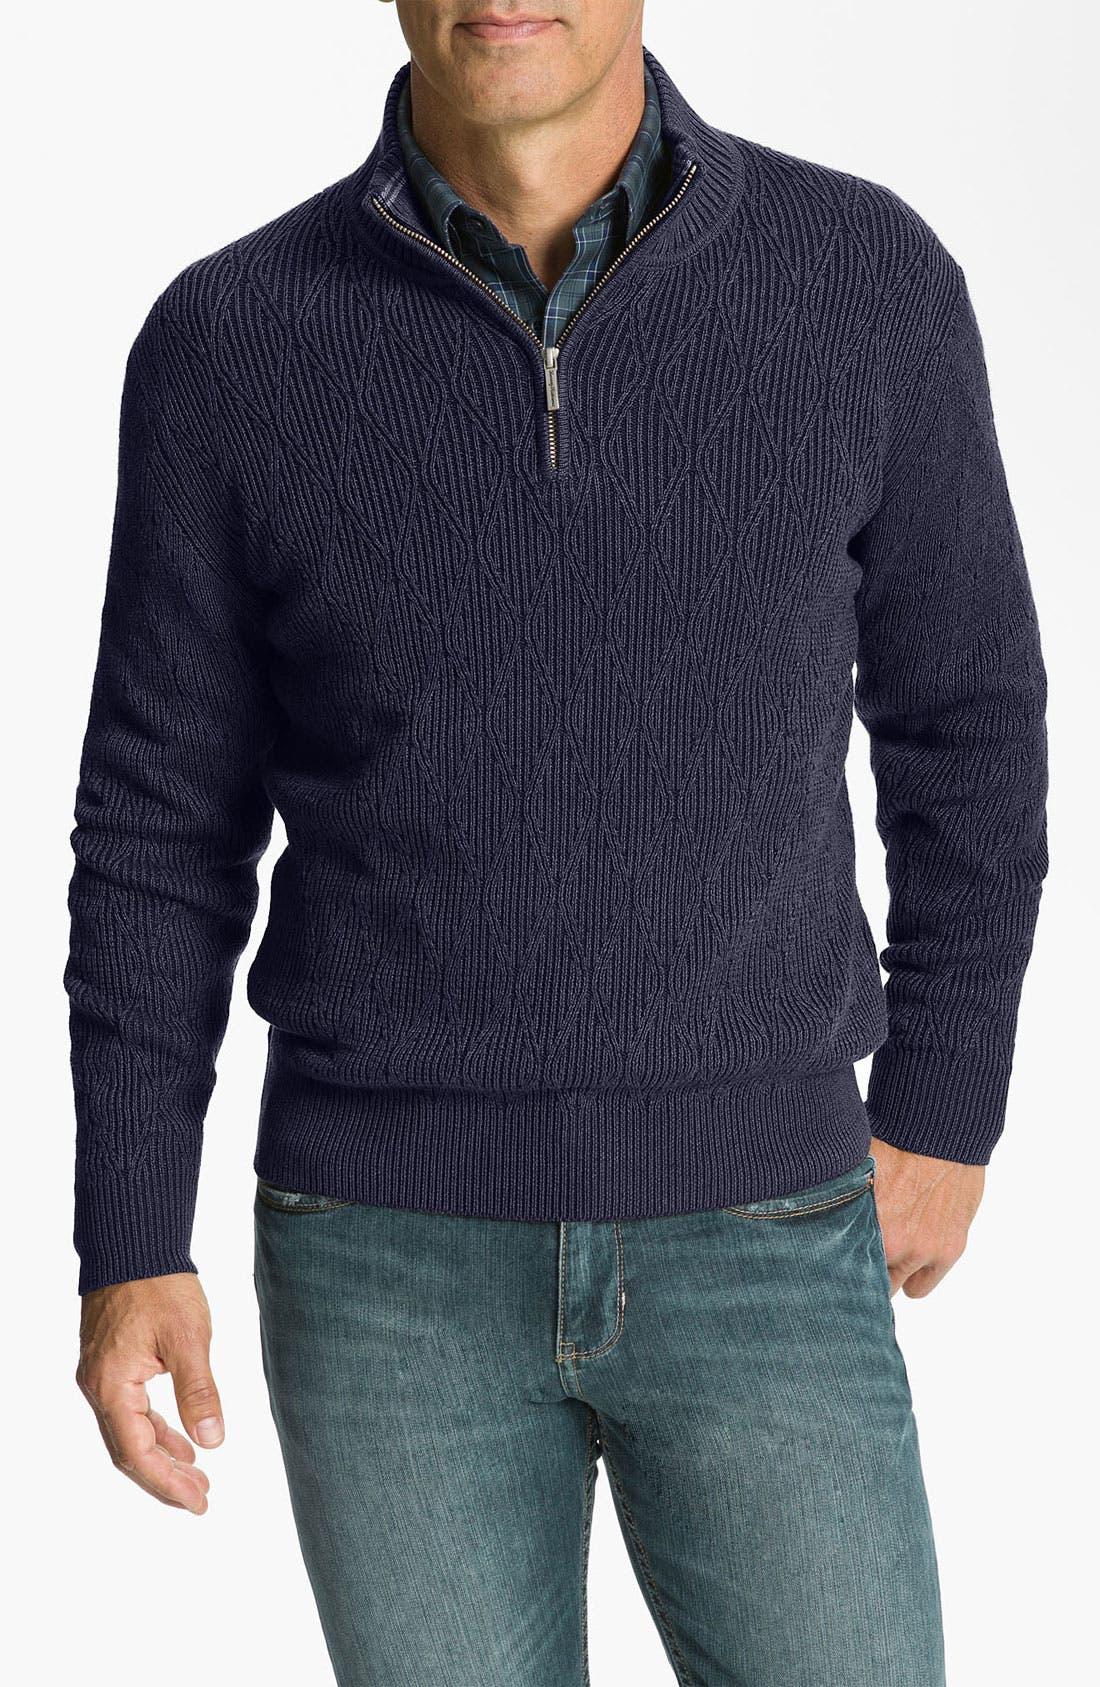 Main Image - Tommy Bahama 'Coastal Fairway' Half Zip Sweater